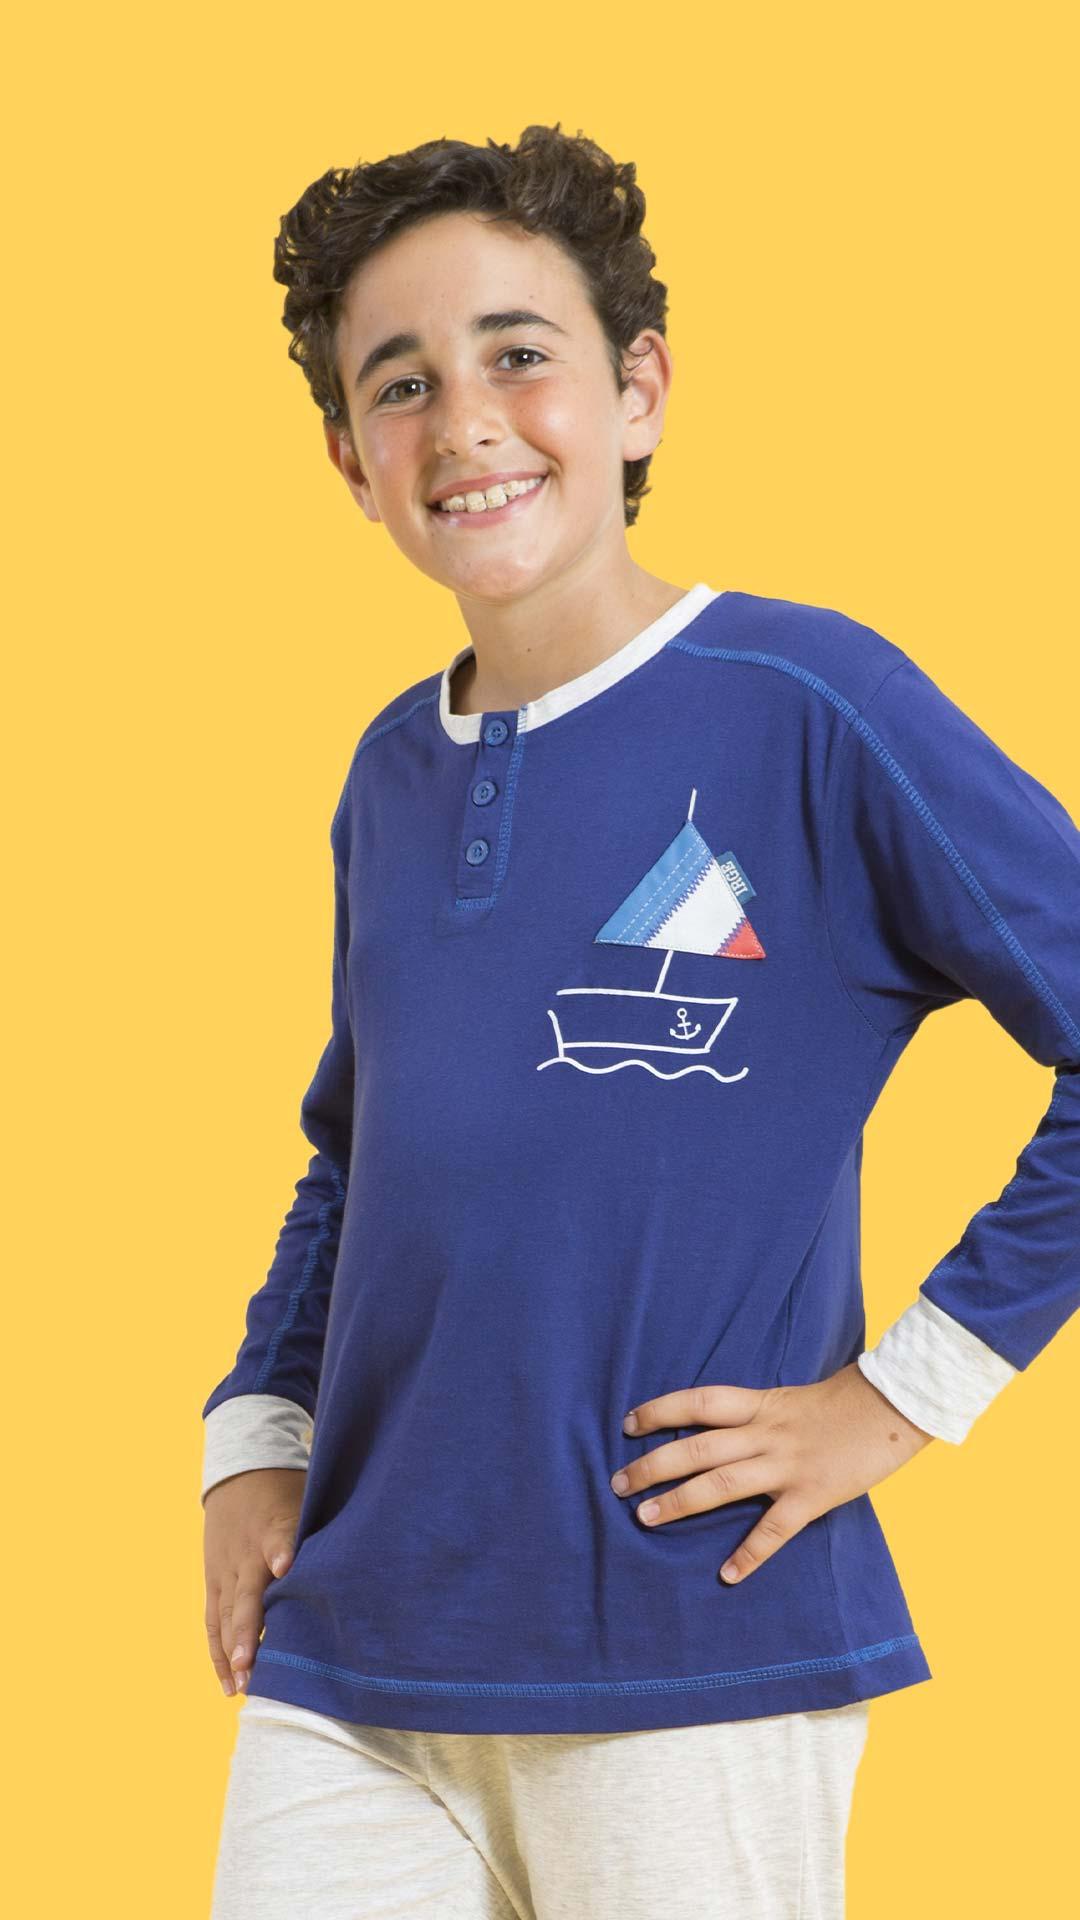 Irge-il-pigiama-categoria-bambini-full-1